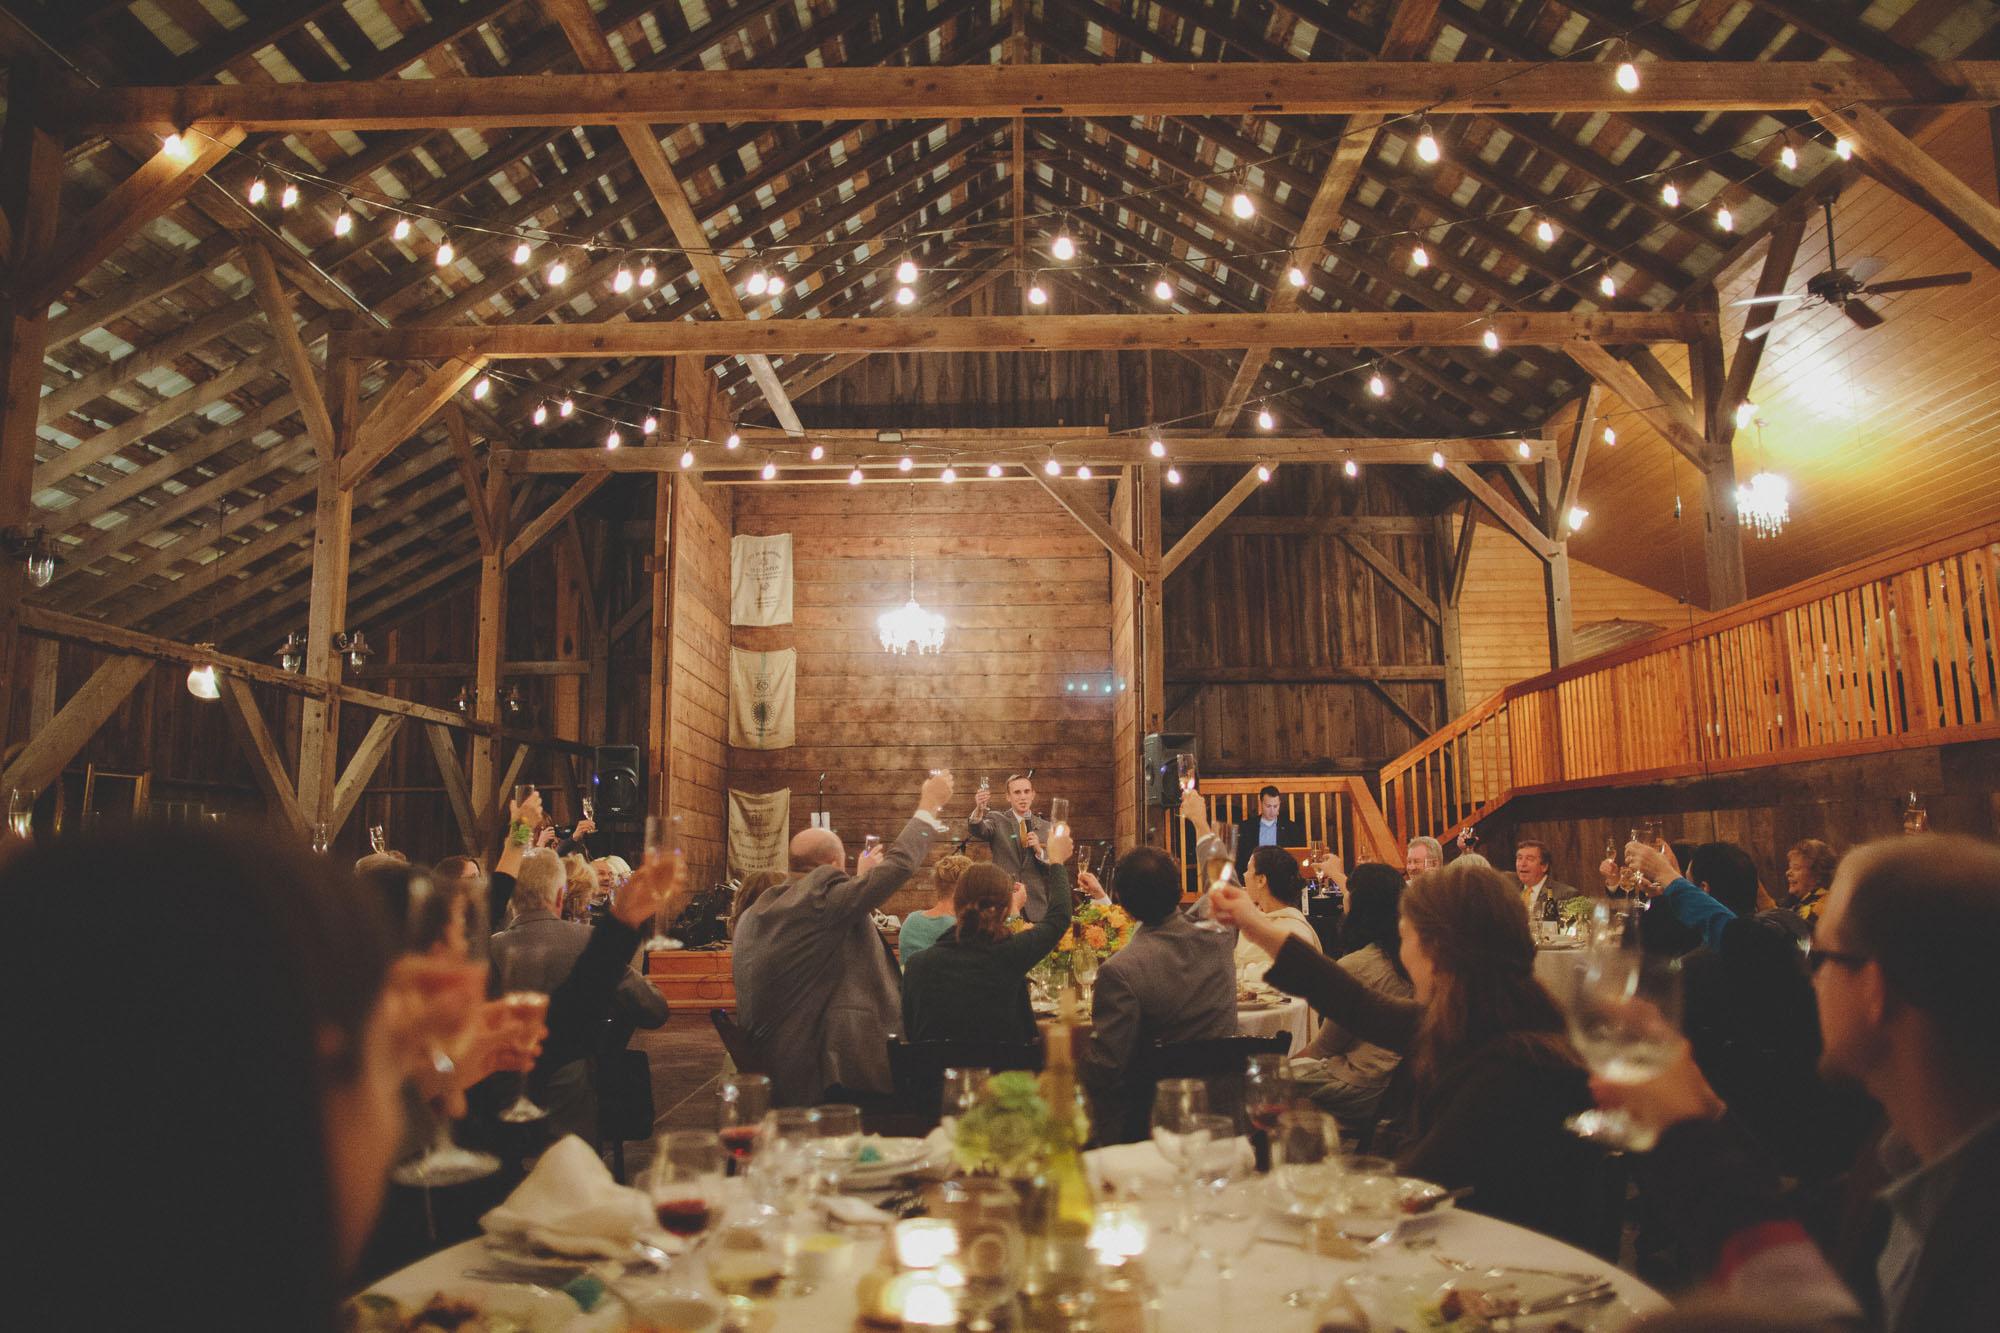 Gretchen_Gause_Petaluma_Olympias_Valley_Wedding_Photo-224.jpg